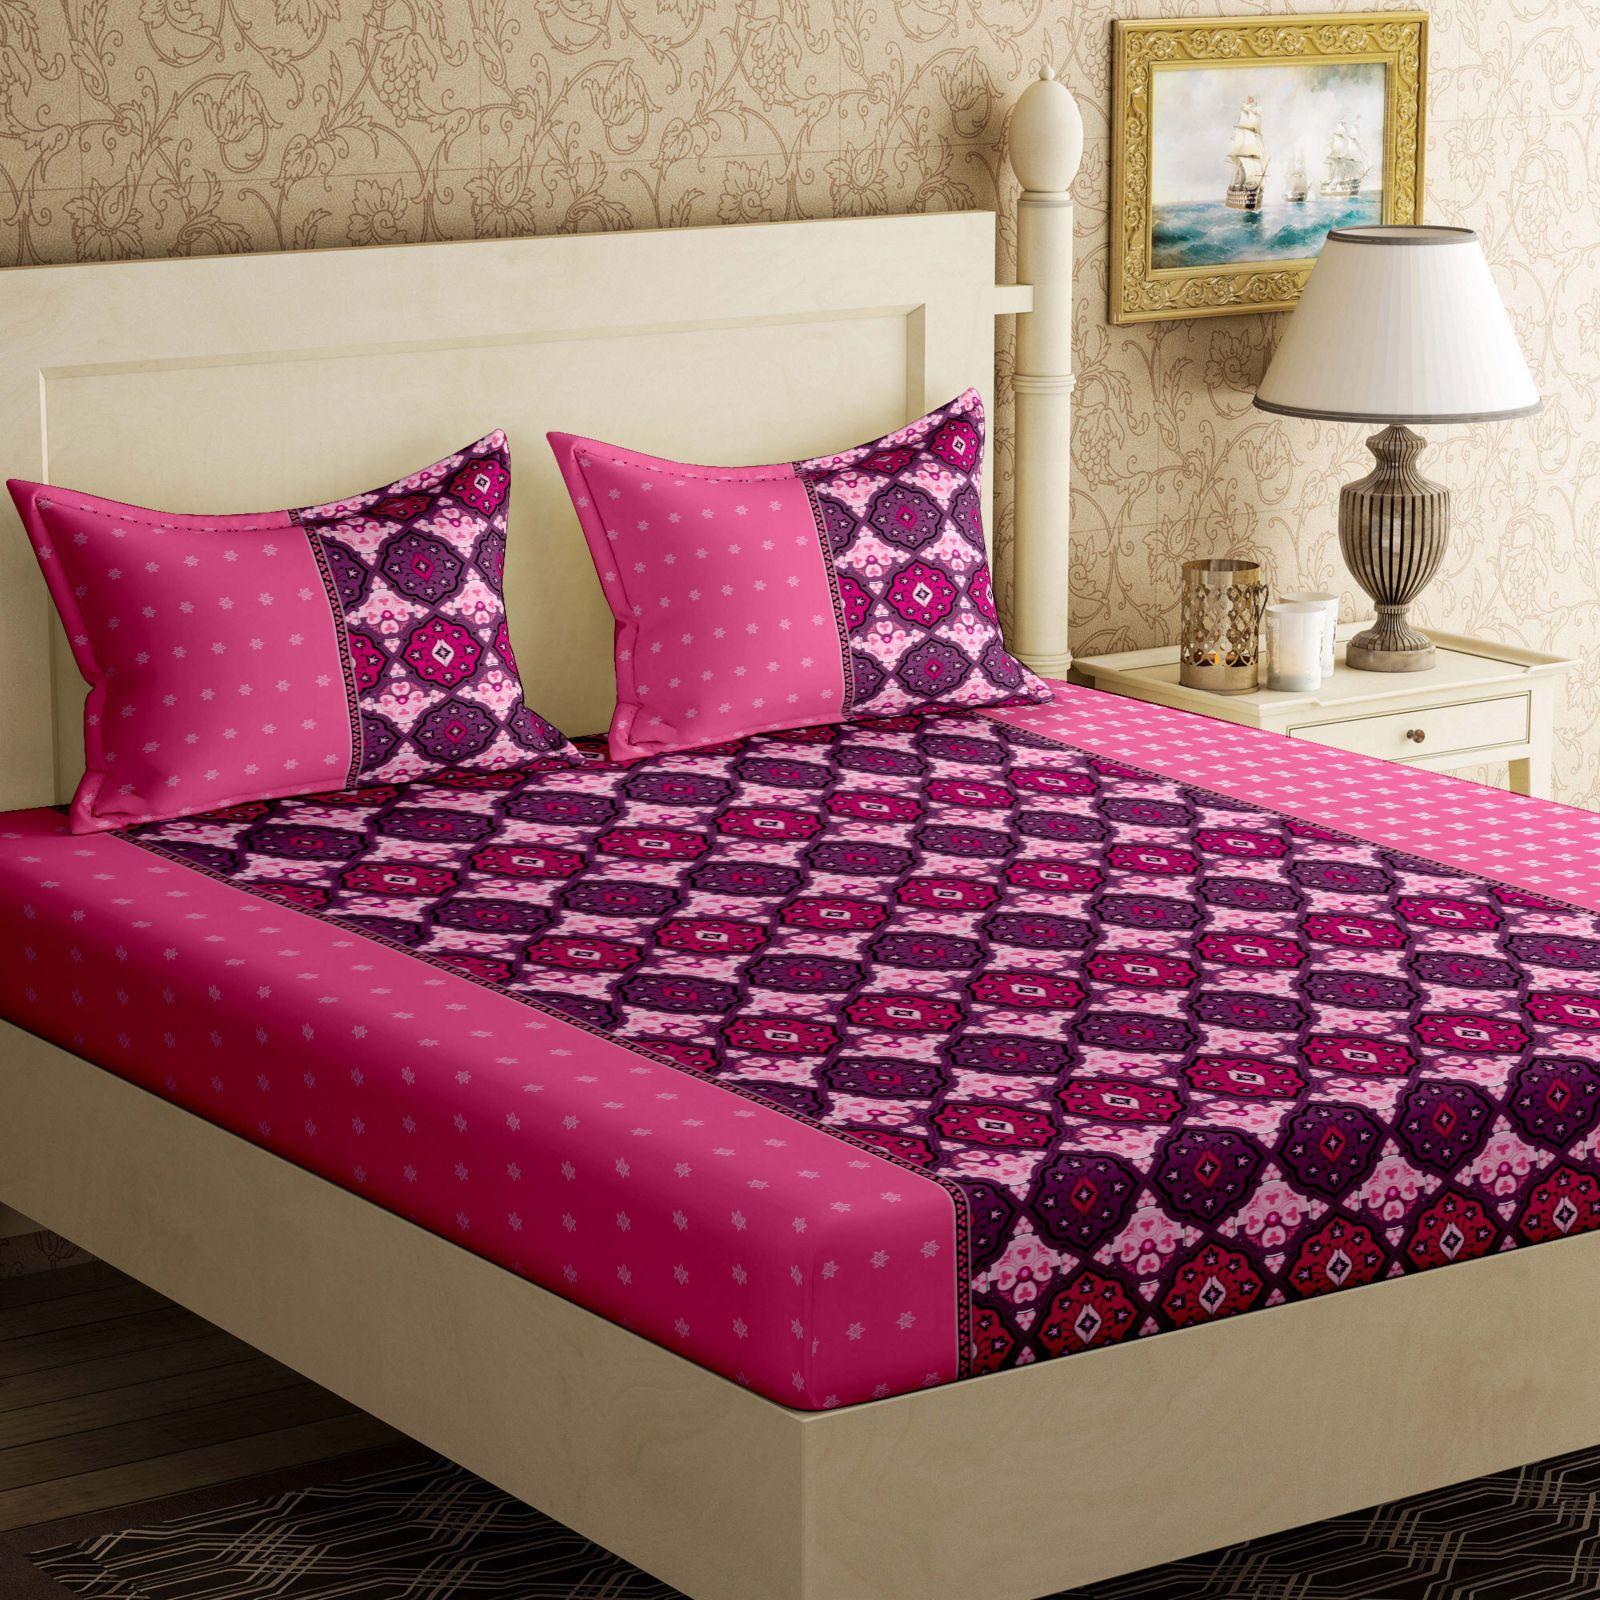 Bella Casa 104 TC Cotton Double Floral Bedsheet  (1Bed-sheet,2 Pillow covers, Multicolor)